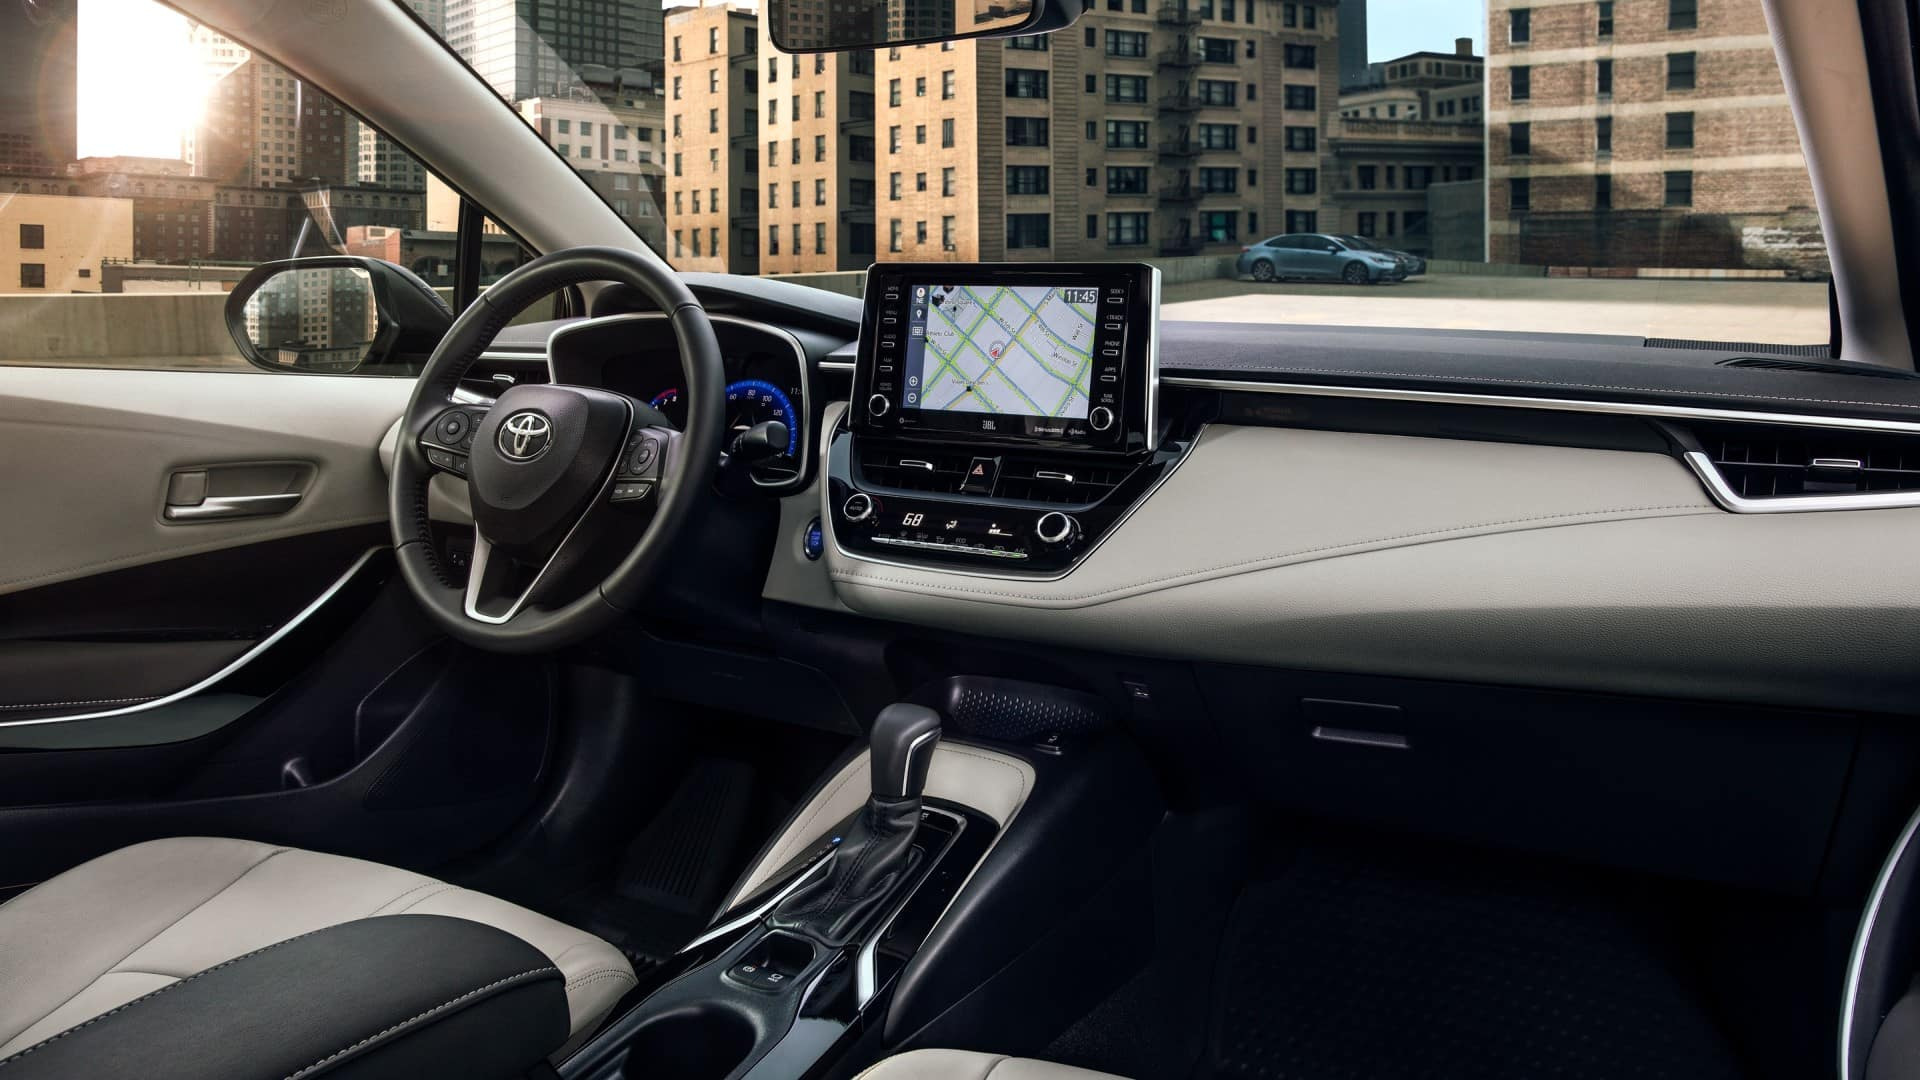 Toyota_Corolla_Interior_Dashboard